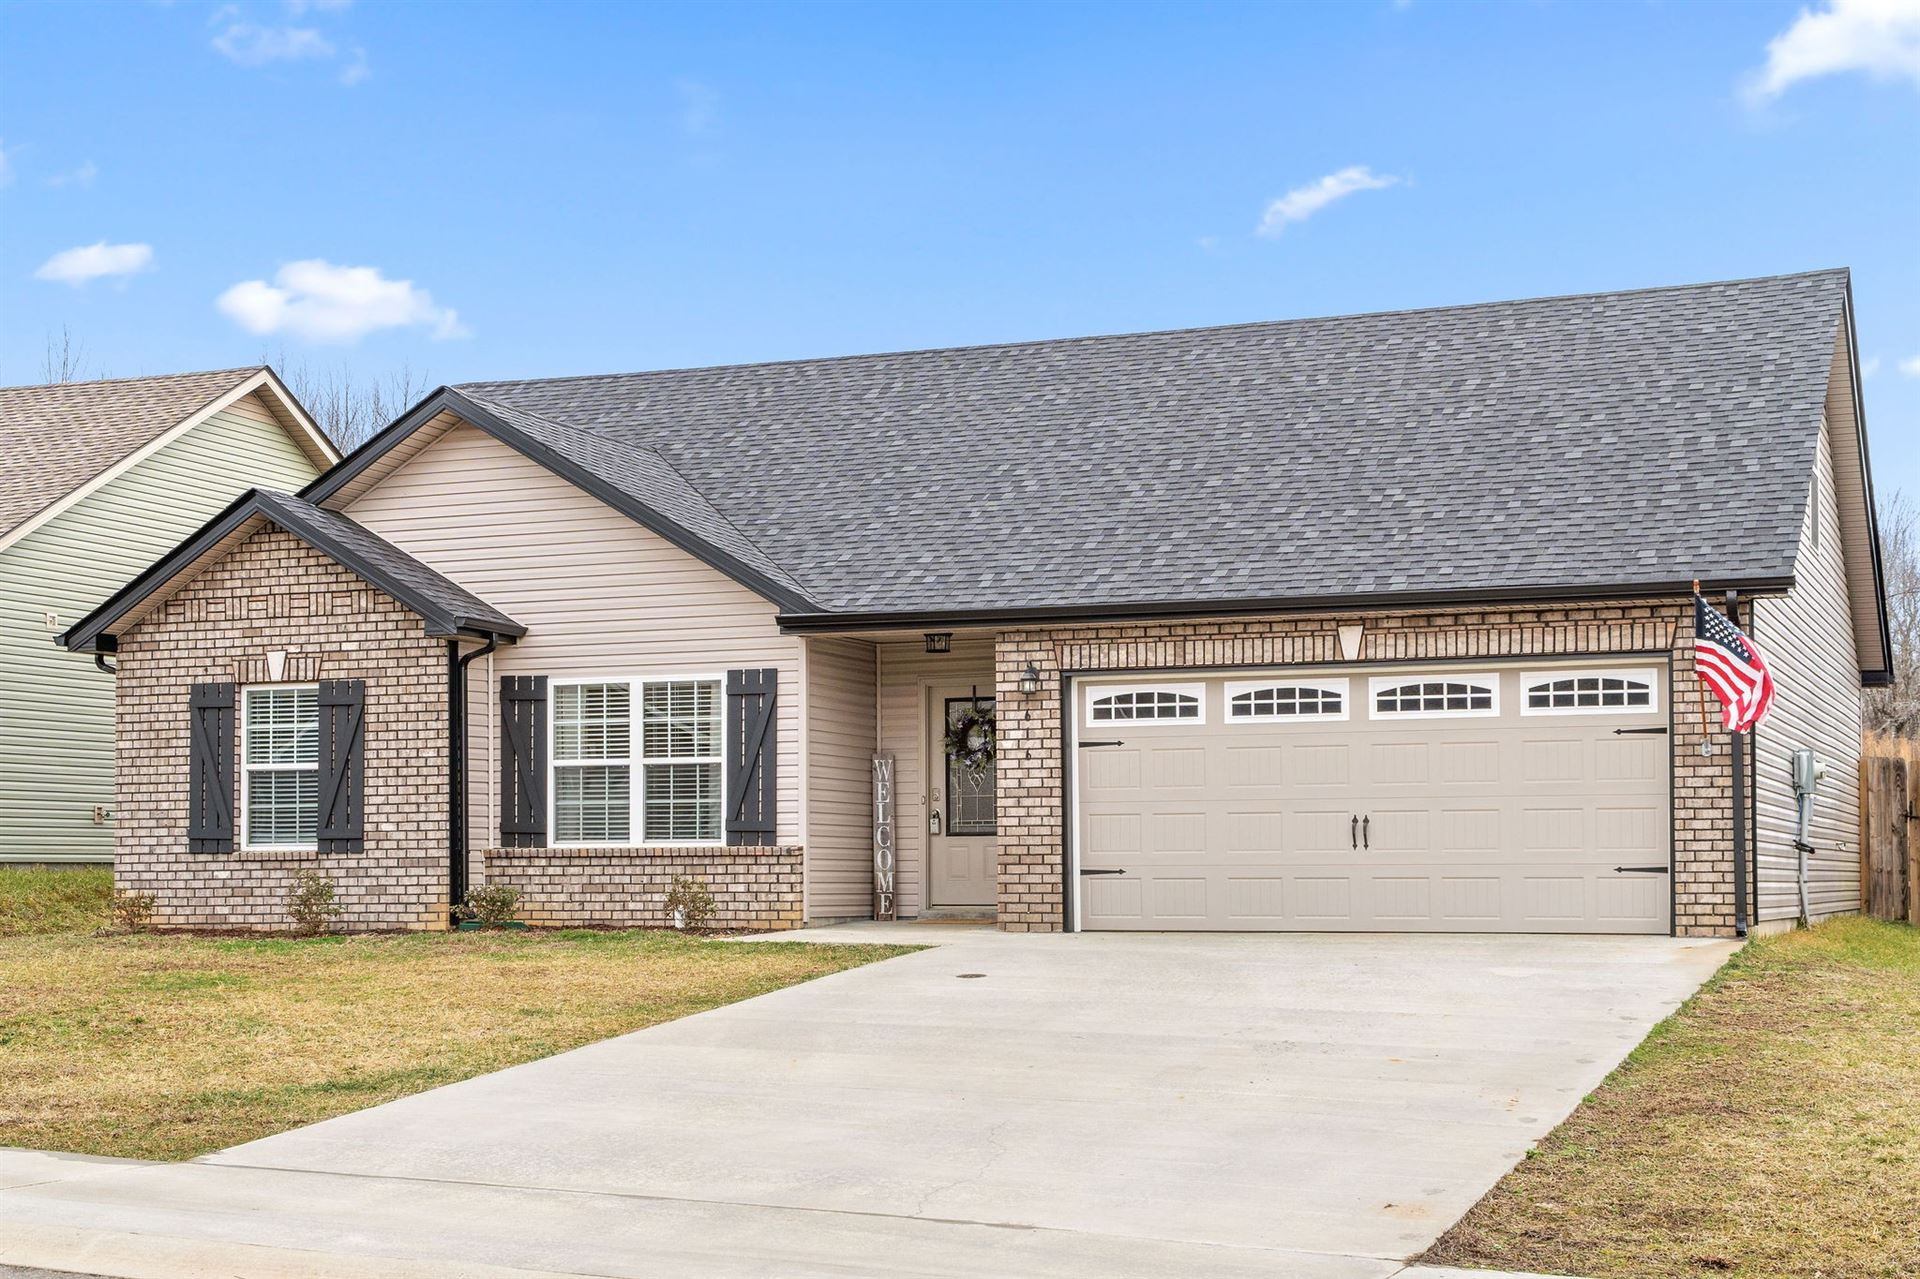 Photo of 616 Hollow Crest, Clarksville, TN 37043 (MLS # 2232270)